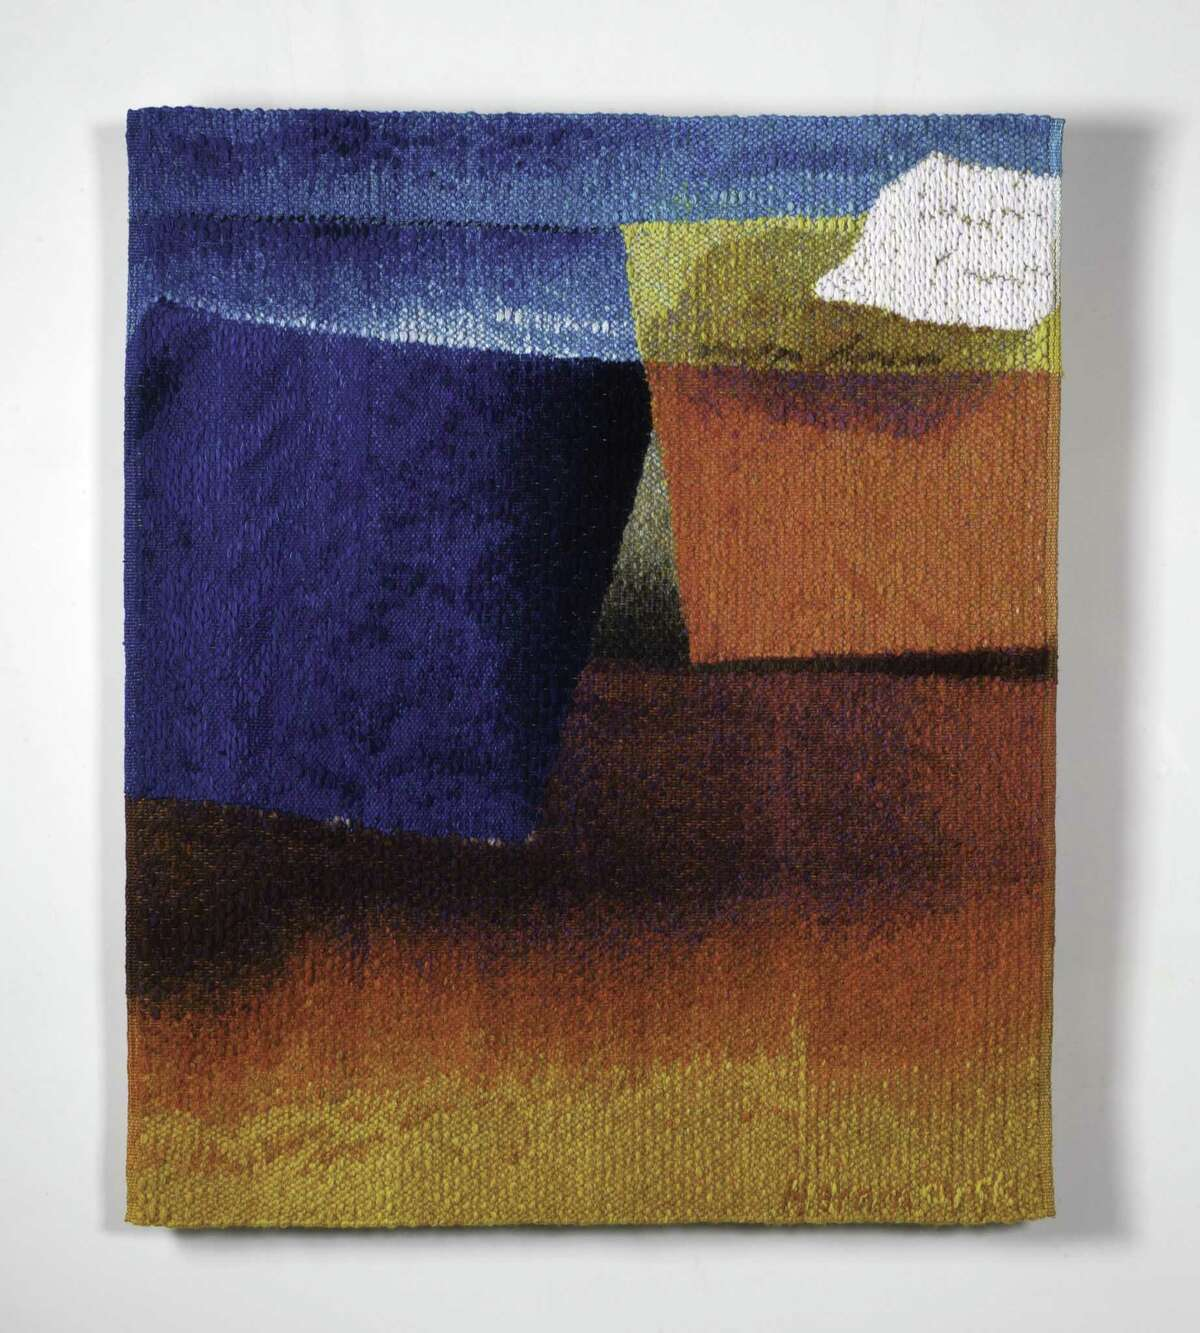 Helena Hernmarck, Tabula Rasa 2, 2010; Courtesy of the artist and brown grotta, Wilton.